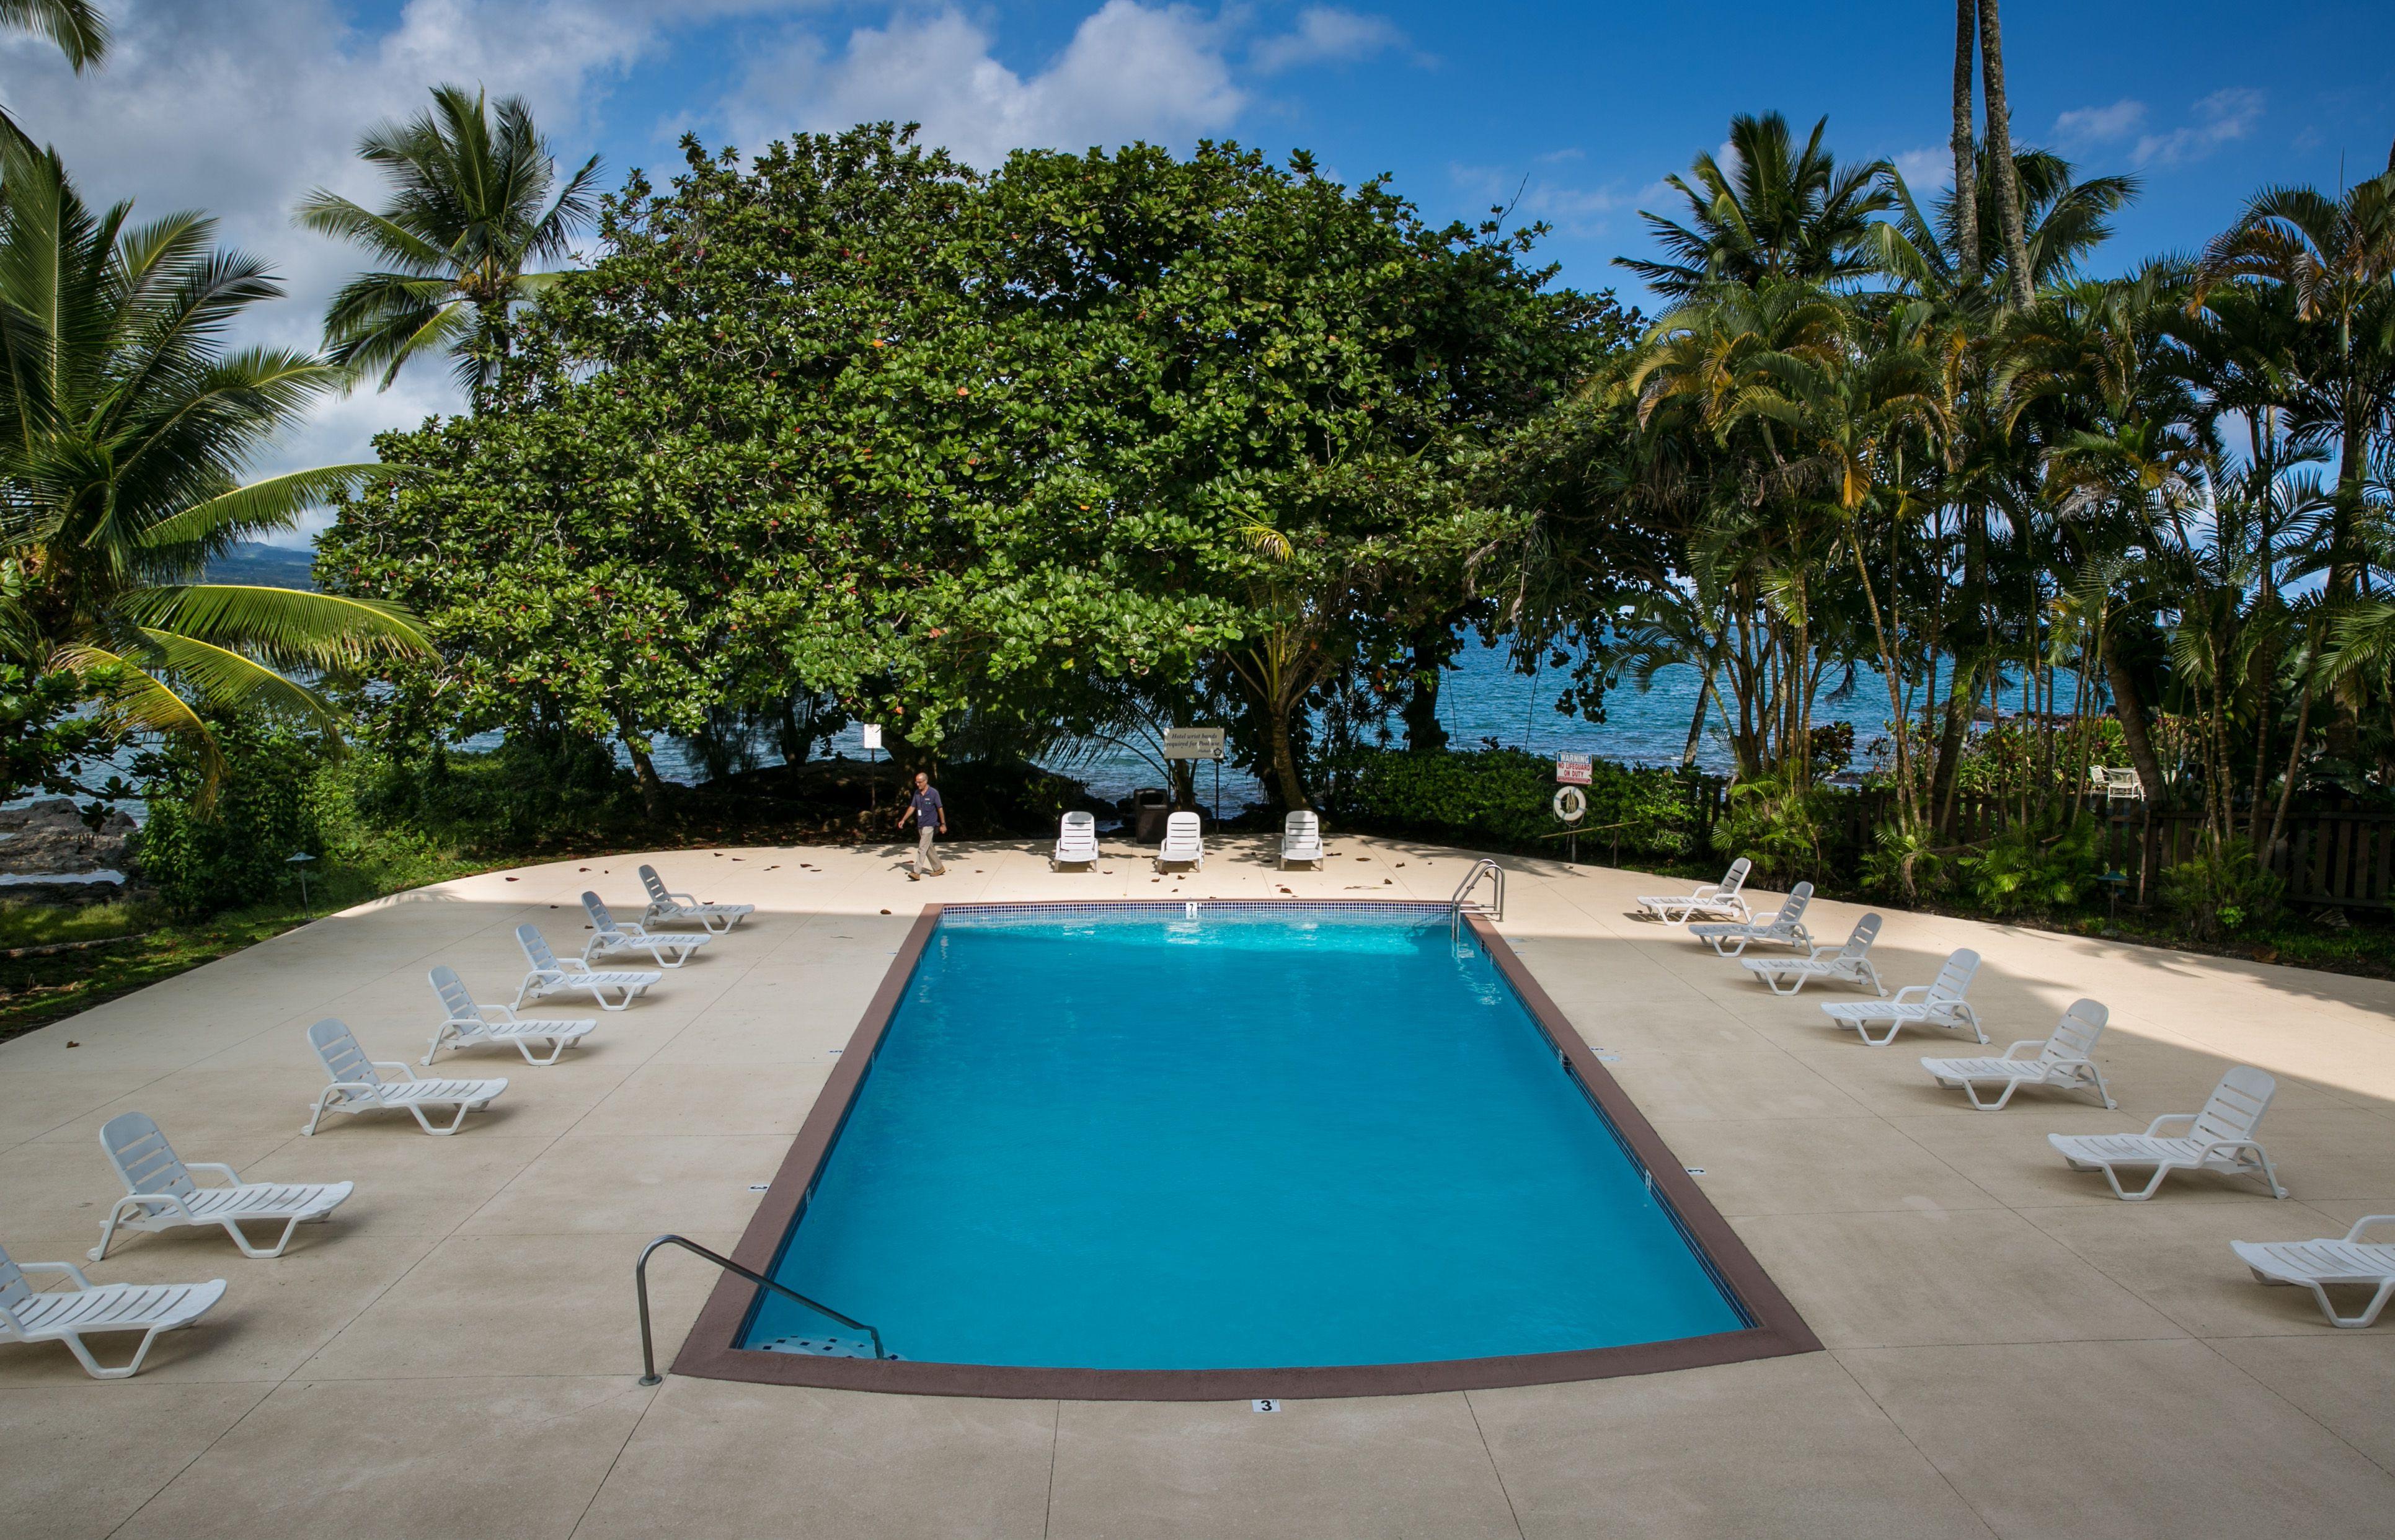 The swimming pool at the Hilo Hawaiian Hotel